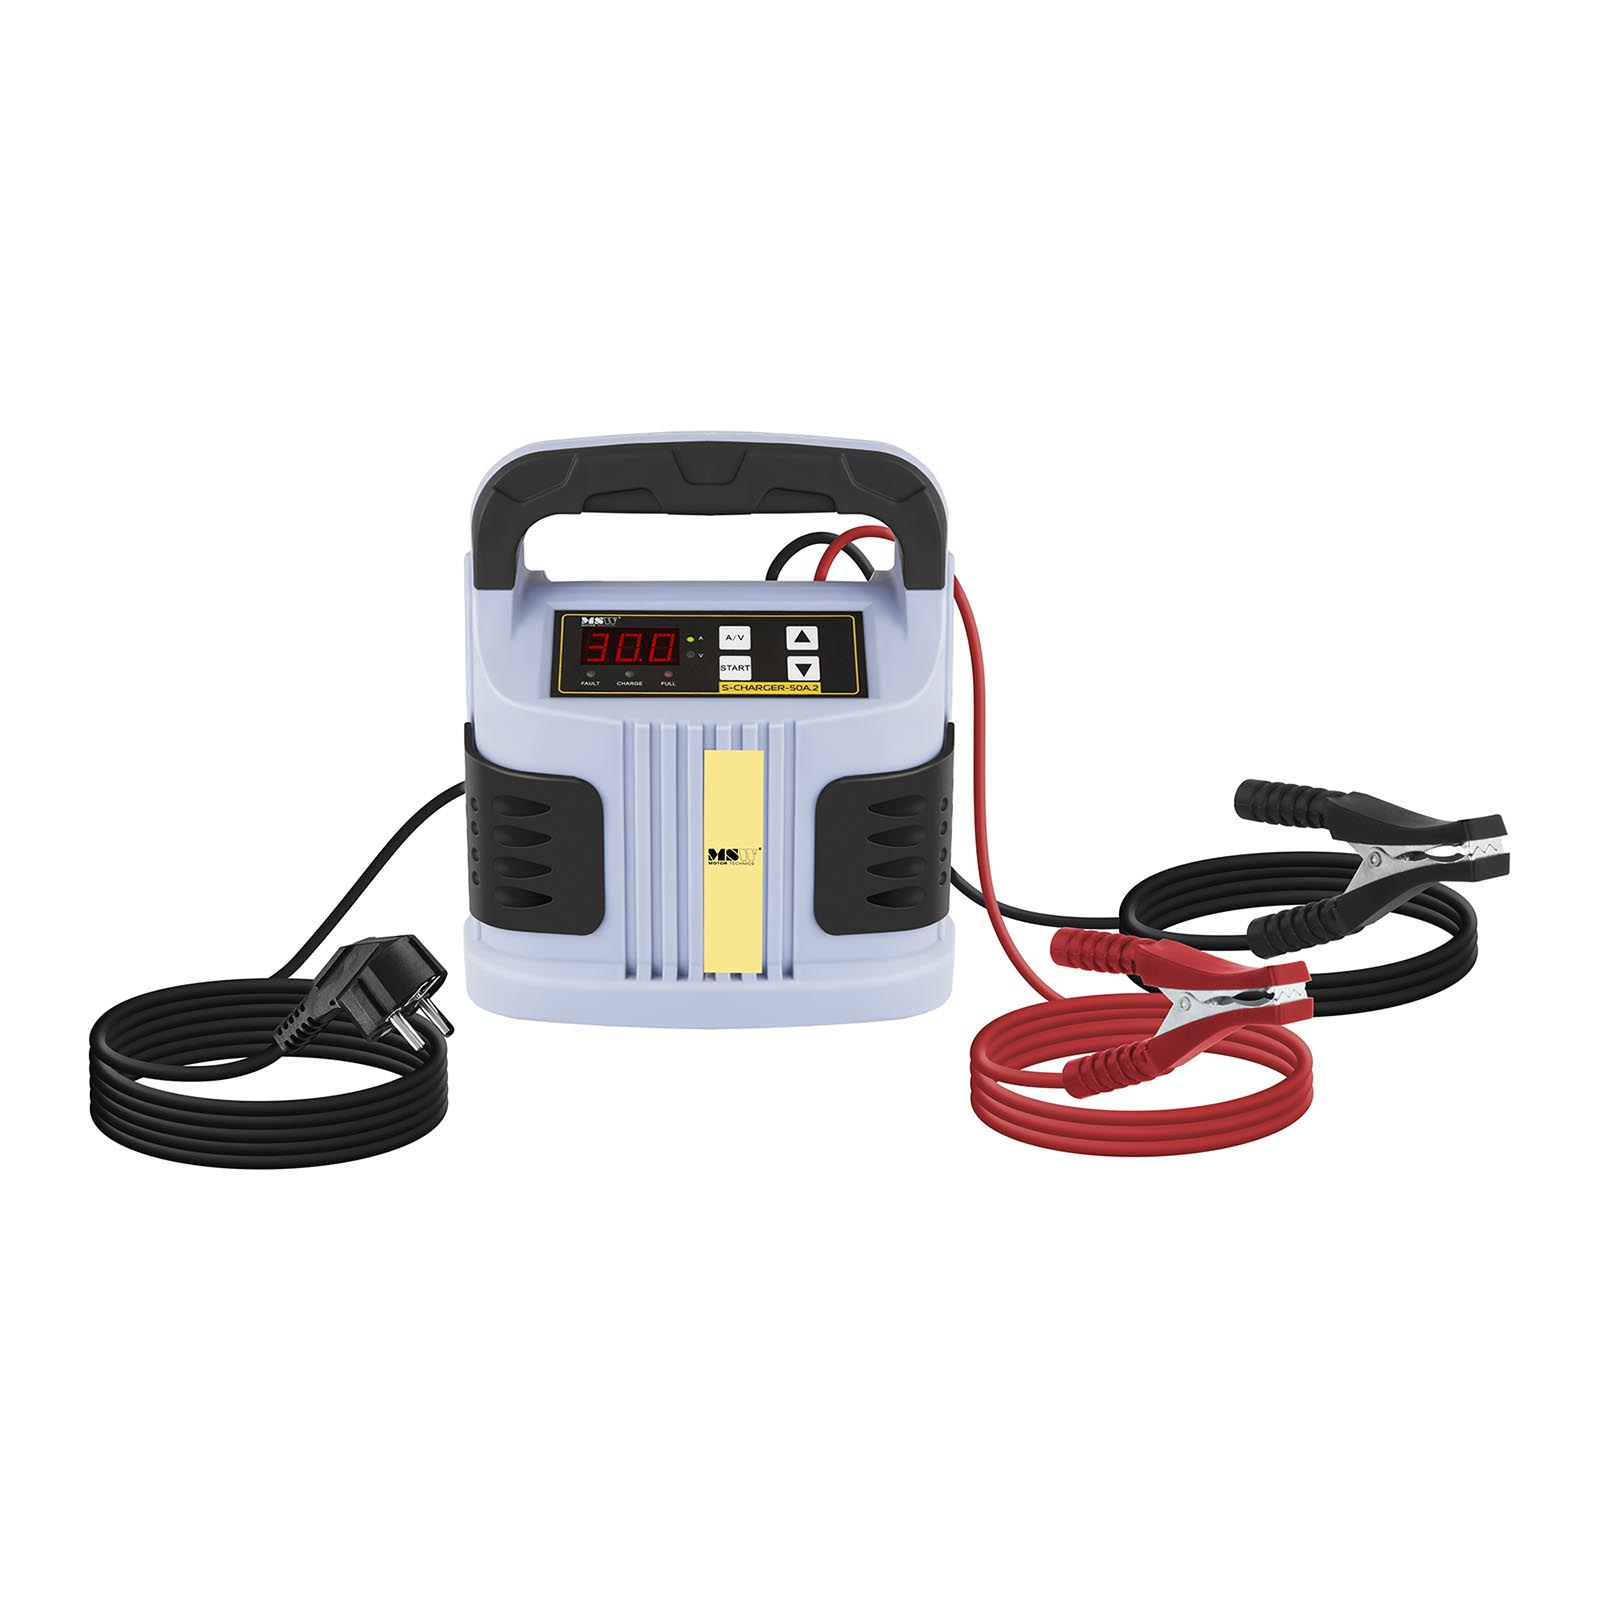 30 Amperebatterieladegerät akku Batterieladegerät Mit Starthilfe 12 V